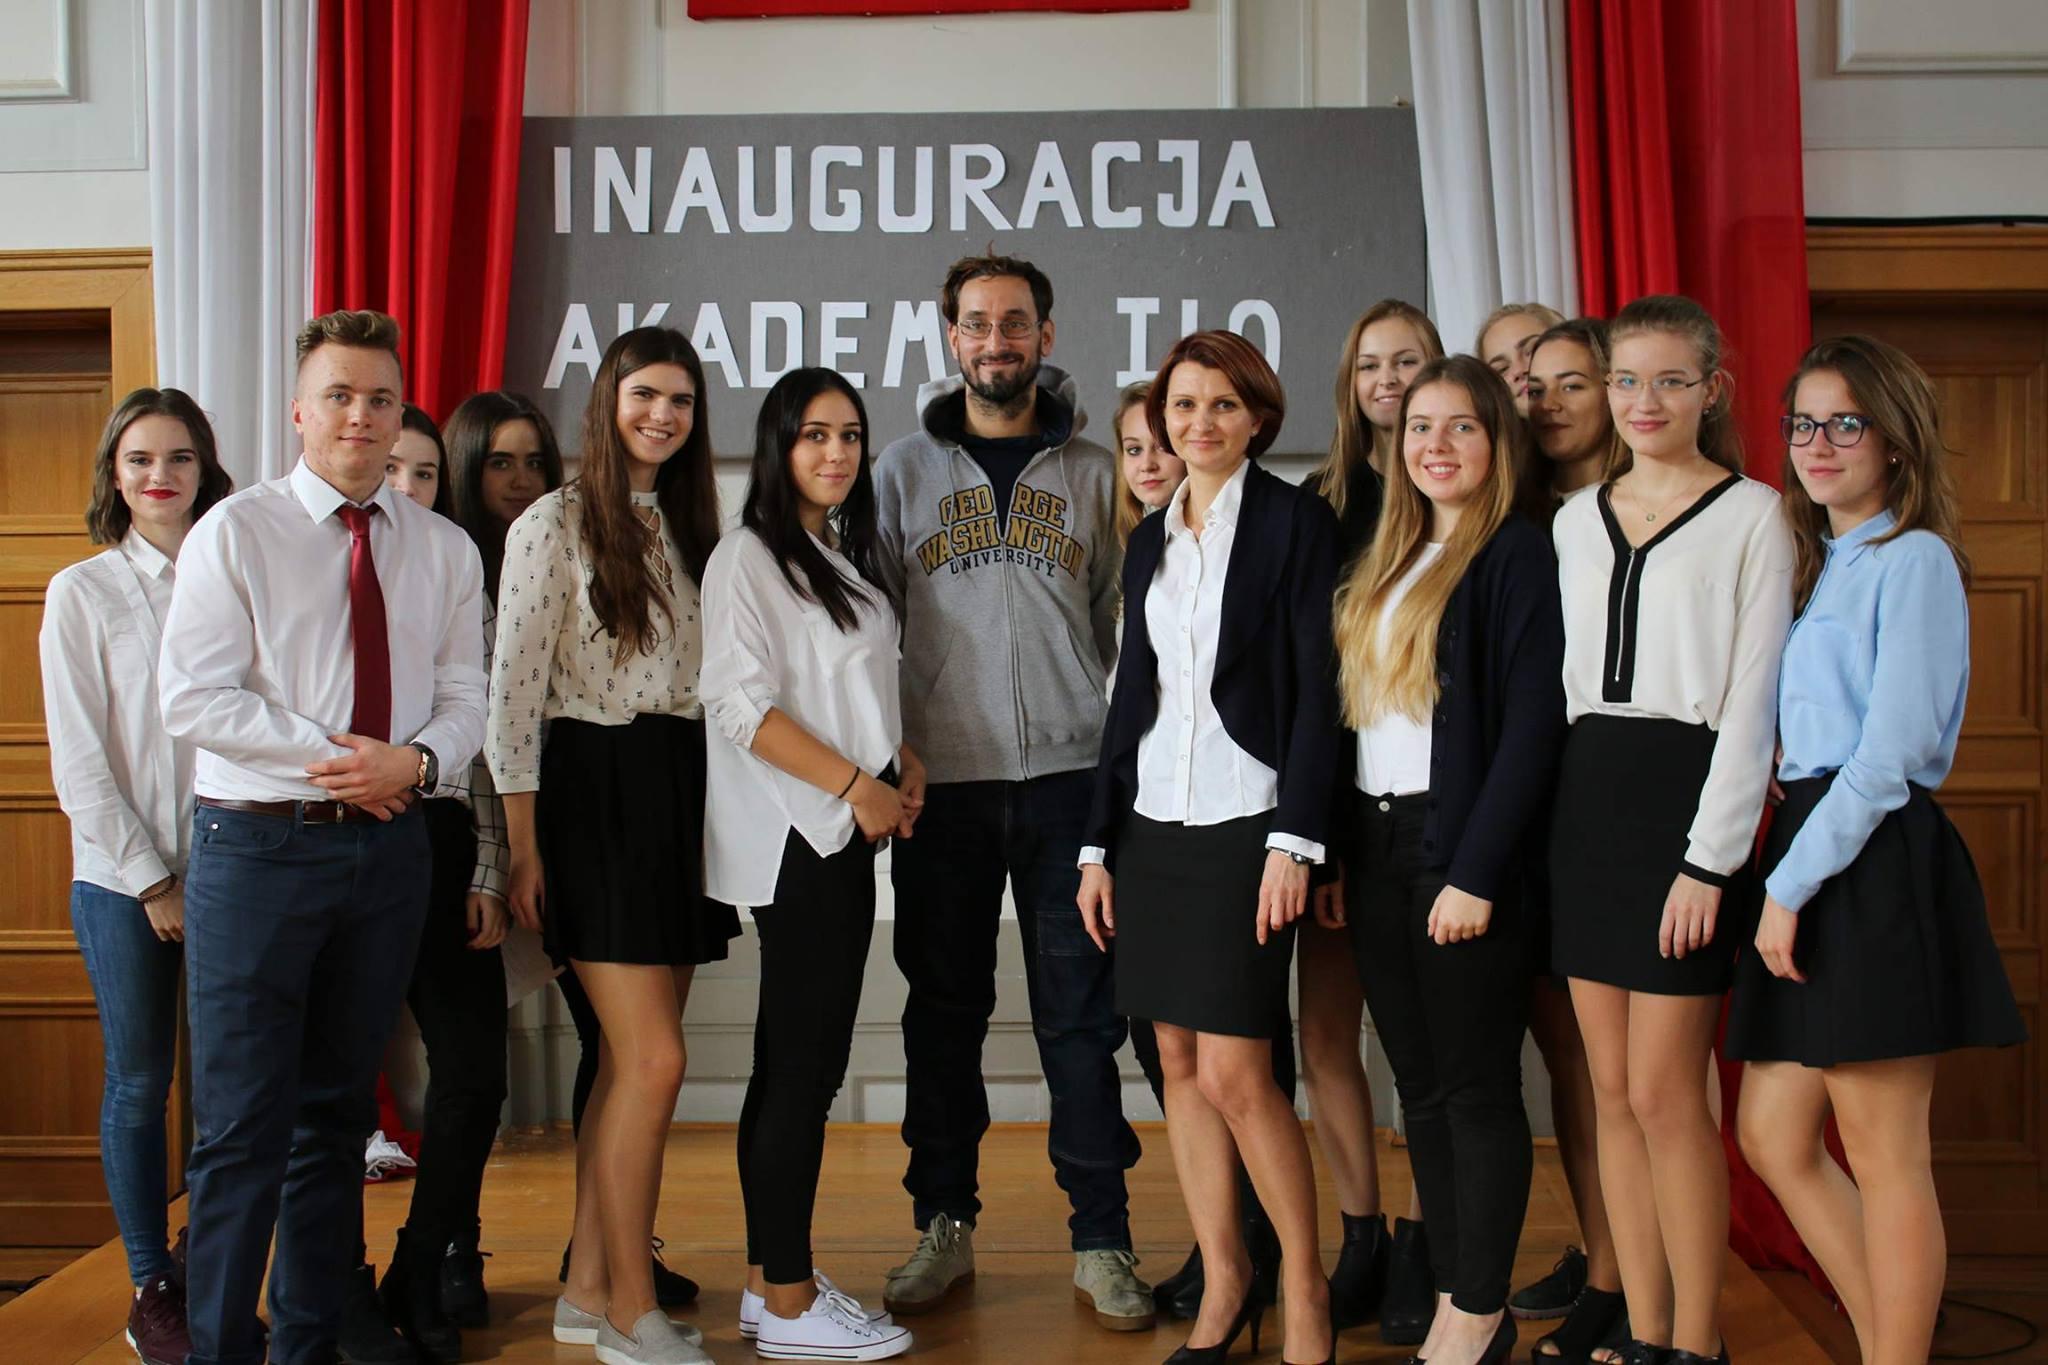 Inauguracja roku akademickiego AKADEMII I LO 2017/2018